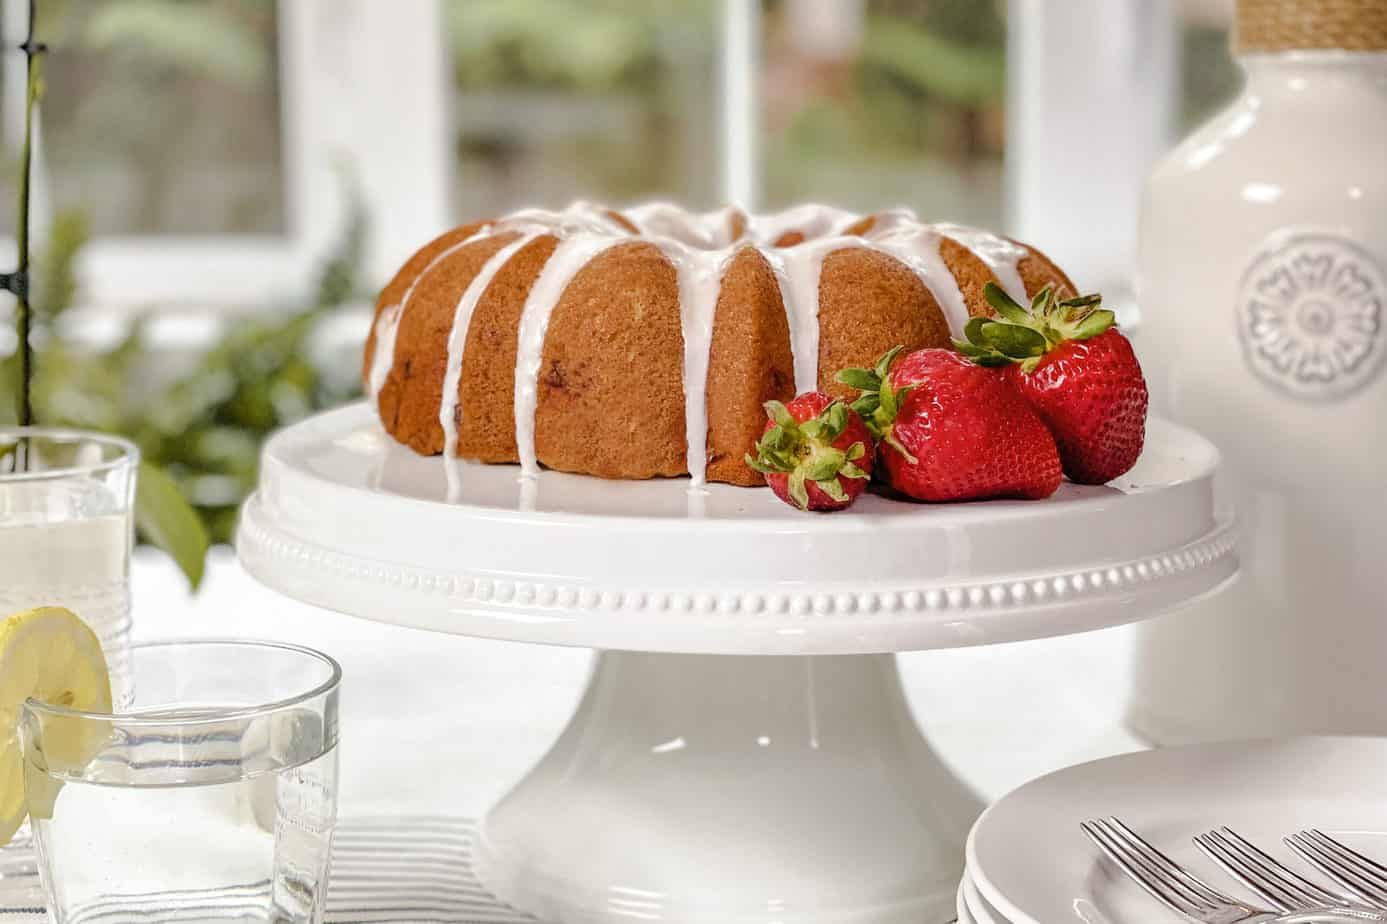 Closeup view of Strawberry Bundt Cake with Lemon Glaze